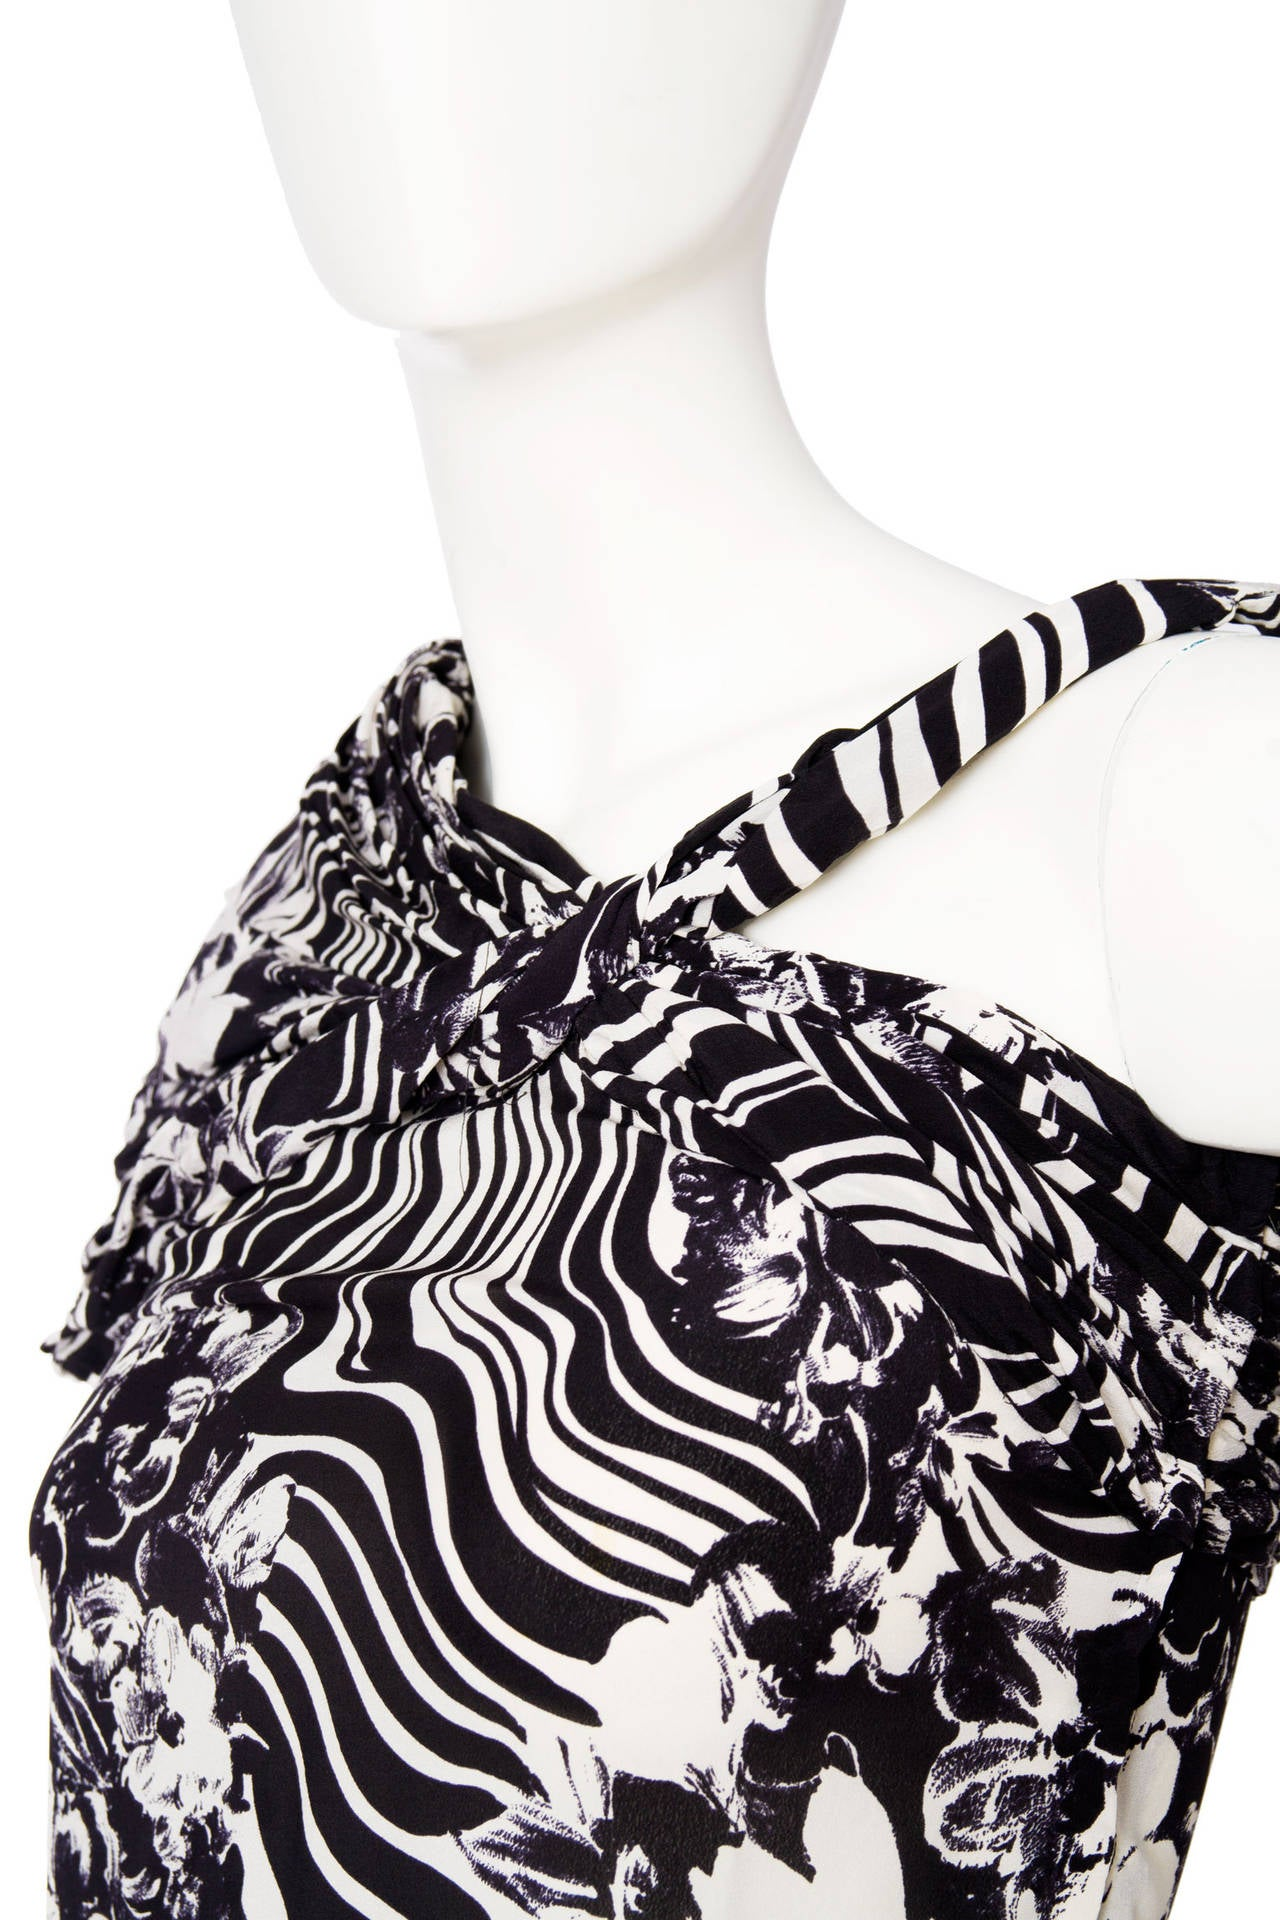 1980s Gianni Versace Monochrome Silk Dress 7